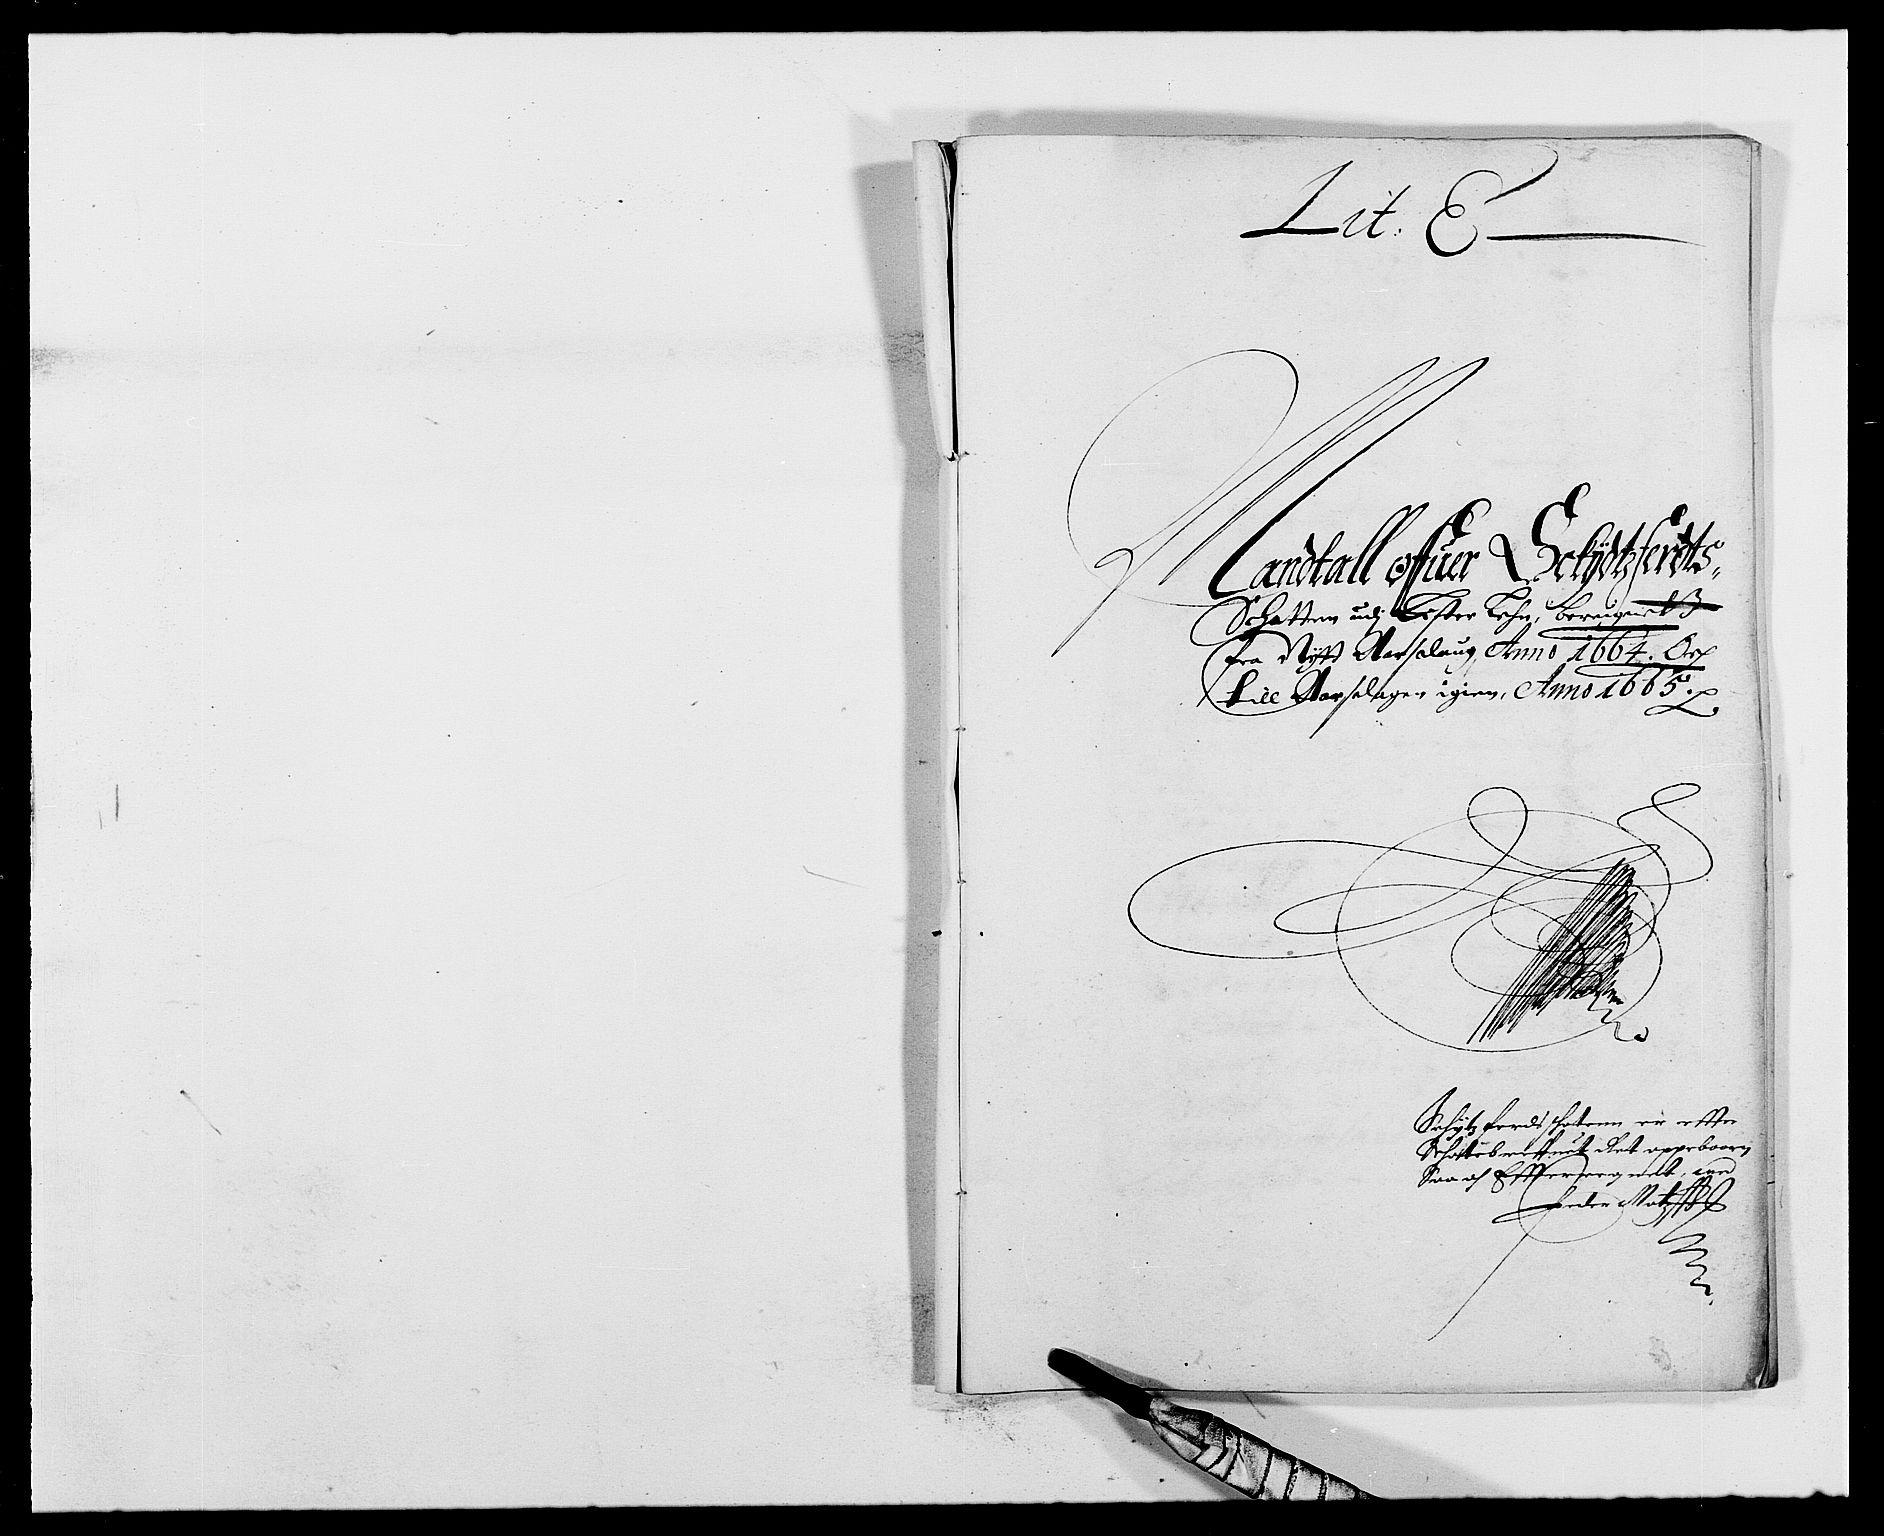 RA, Rentekammeret inntil 1814, Reviderte regnskaper, Fogderegnskap, R41/L2523: Fogderegnskap Lista, 1663-1664, s. 301